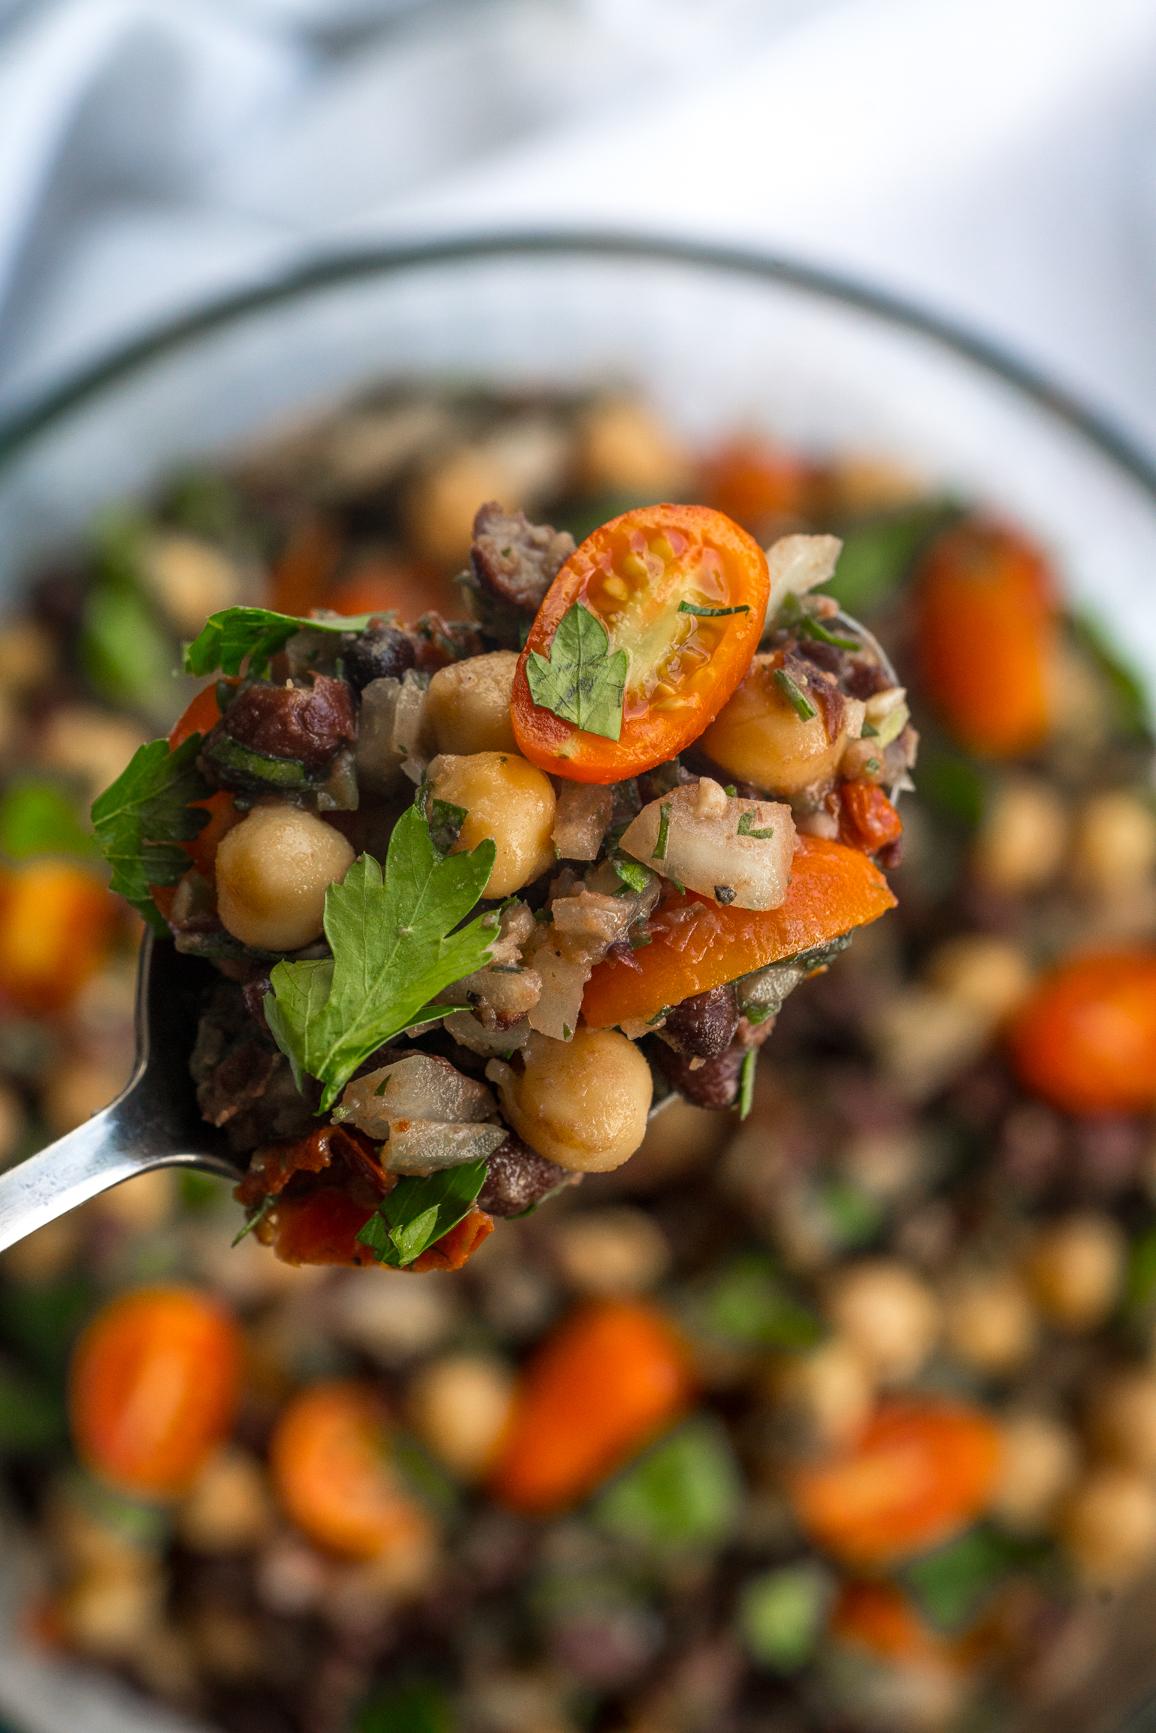 Balela-Salad-Vertical-9-of-12